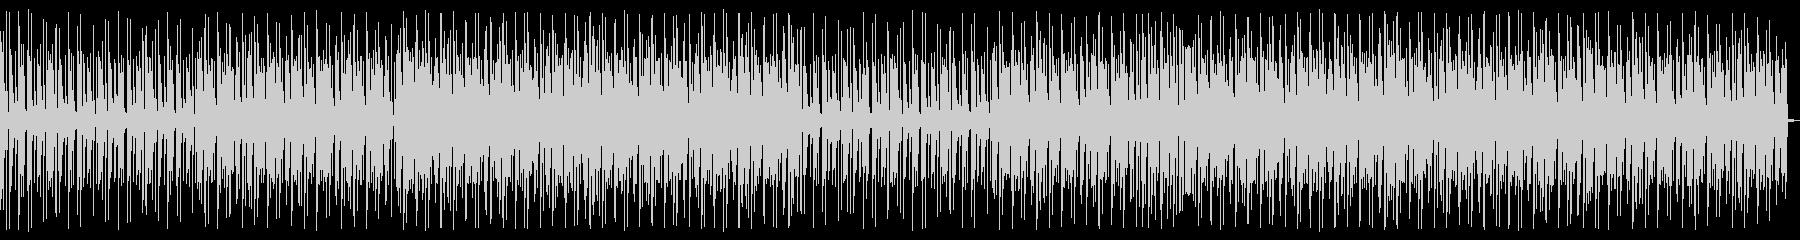 Digital. graphic. Techno_5's unreproduced waveform